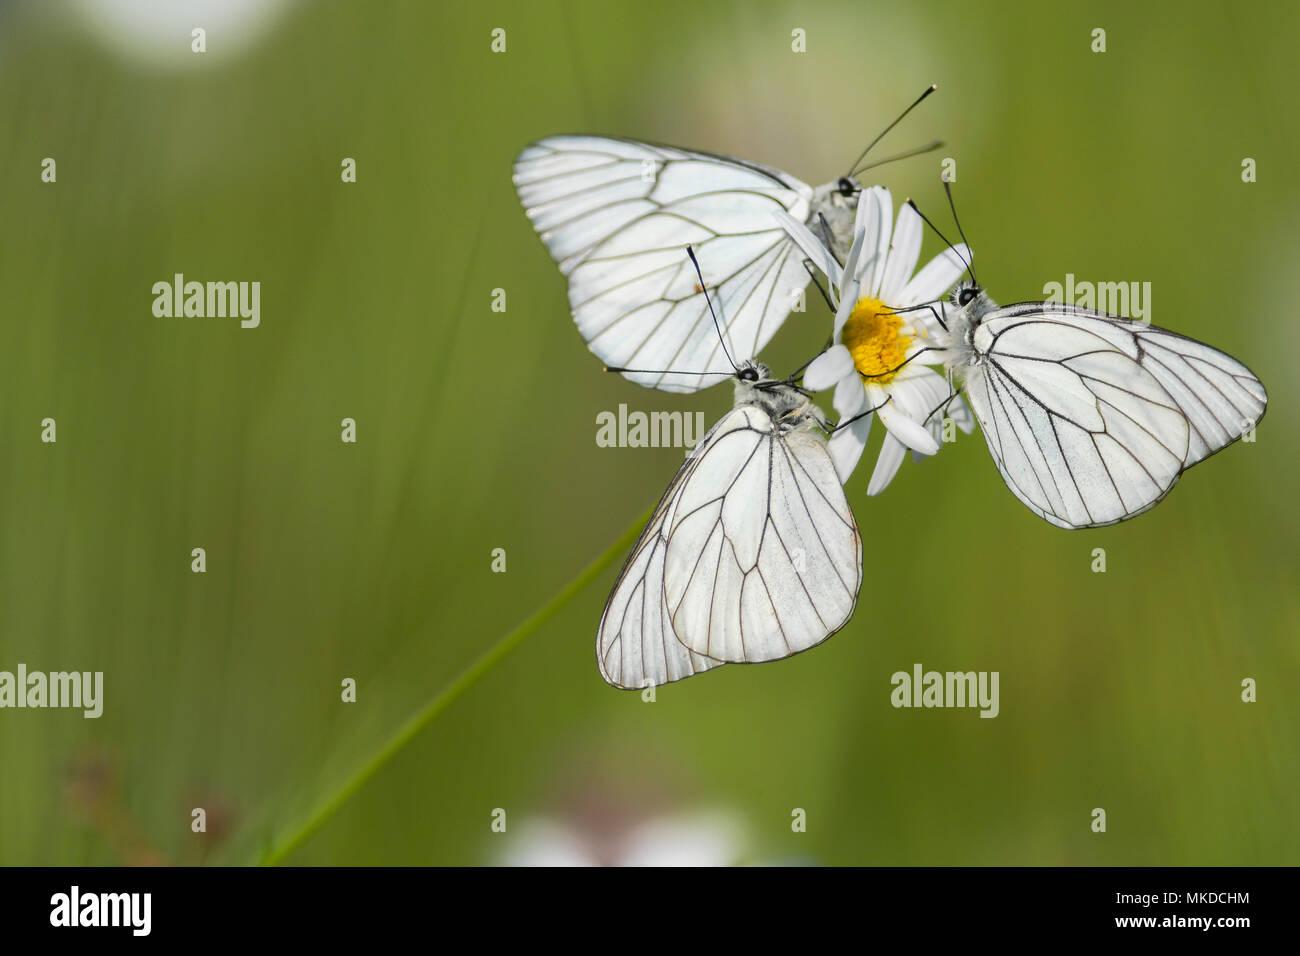 Chrysanthemum leucanthemum stock photos chrysanthemum leucanthemum black veined whites aporia crataegi on a flower of daisy in a wet izmirmasajfo Choice Image